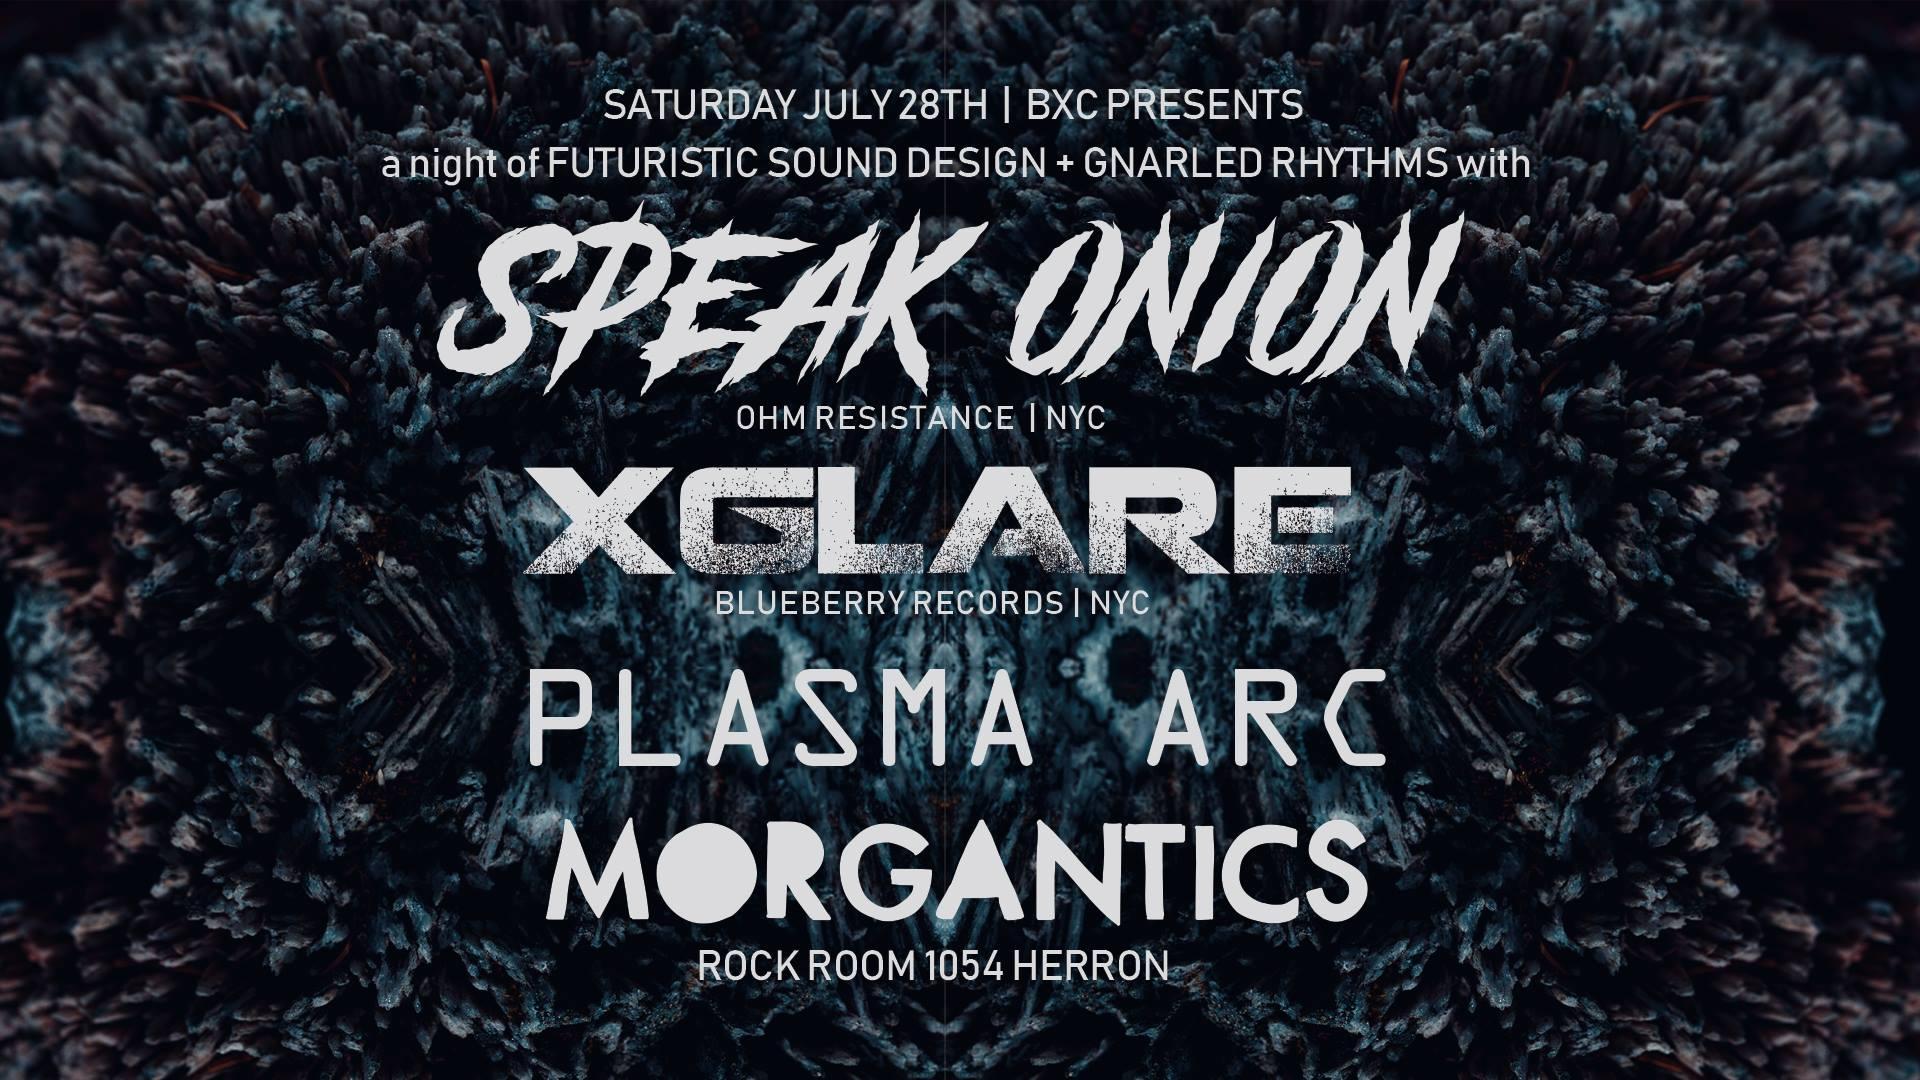 Sat July 28th Speak Onion, Xglare, Plasma Arc, Morgantics @ Rock Room